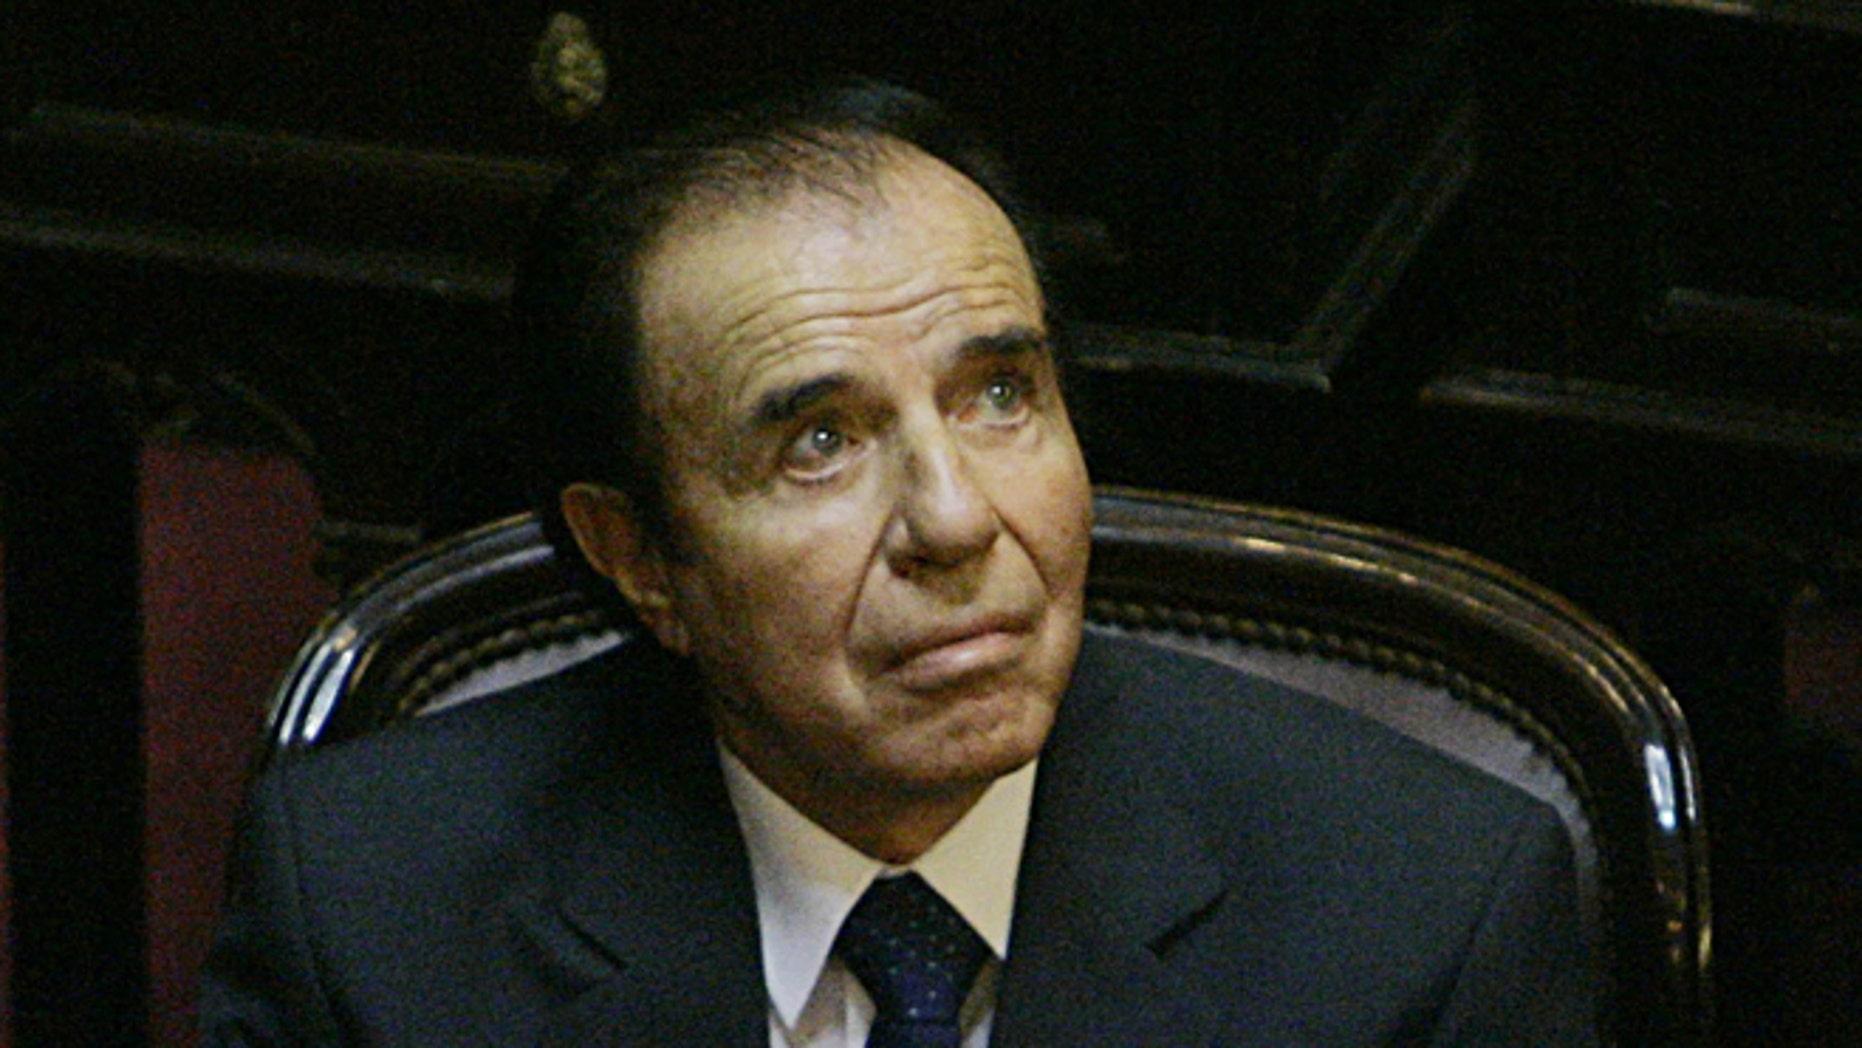 Former Argentine President Carlos Menem in a 2005 file photo.